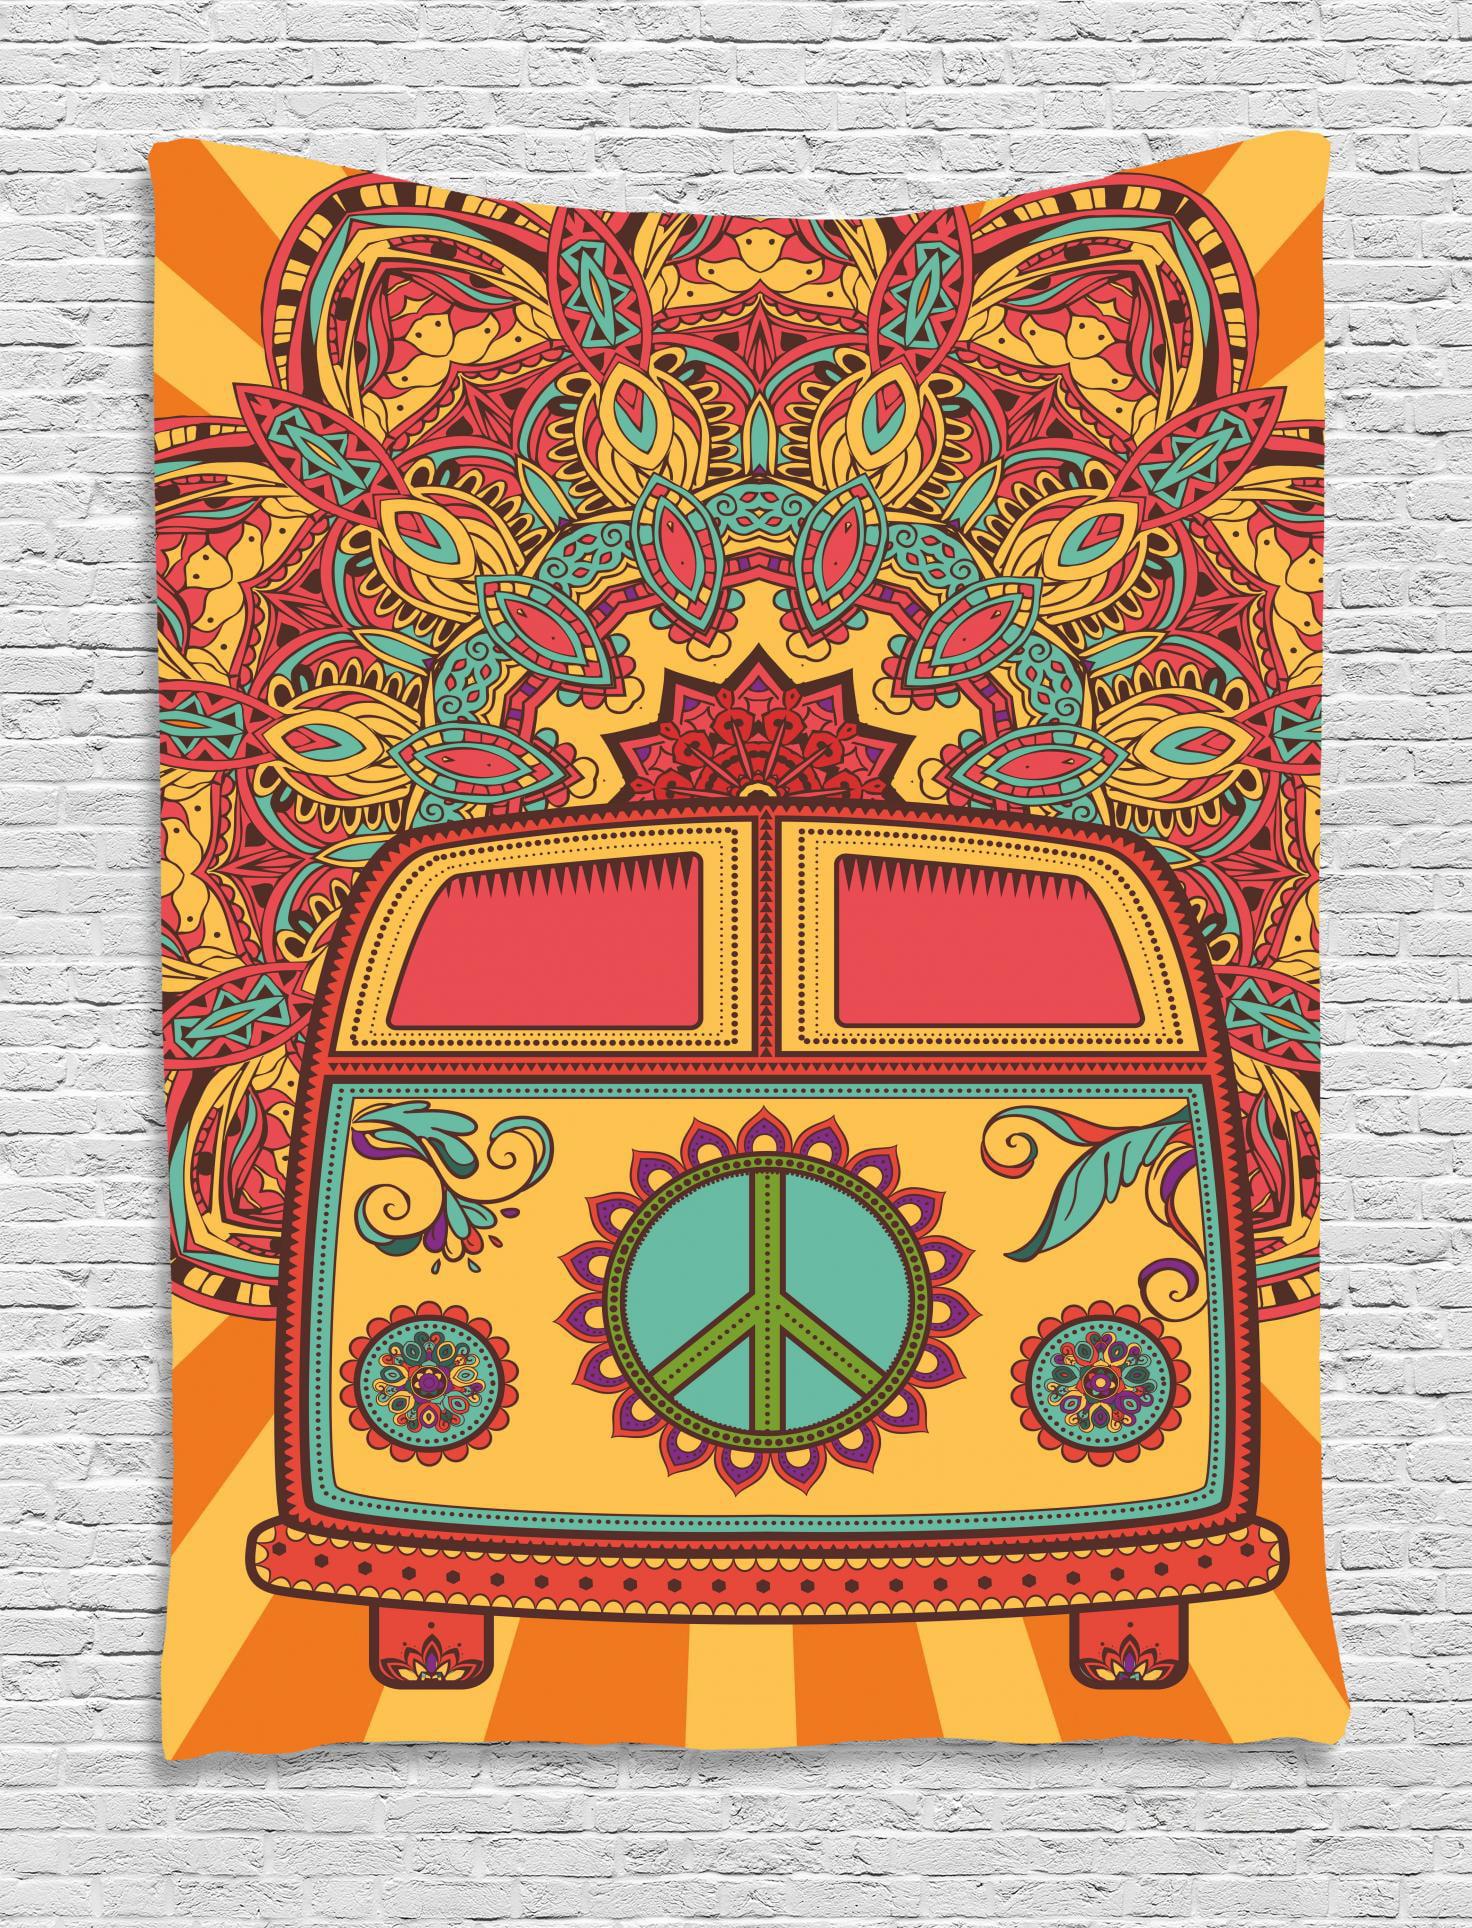 Peace Sign Bedroom Accessories: 70s Party Tapestry, Hippie Vintage Mini Van Ornamental